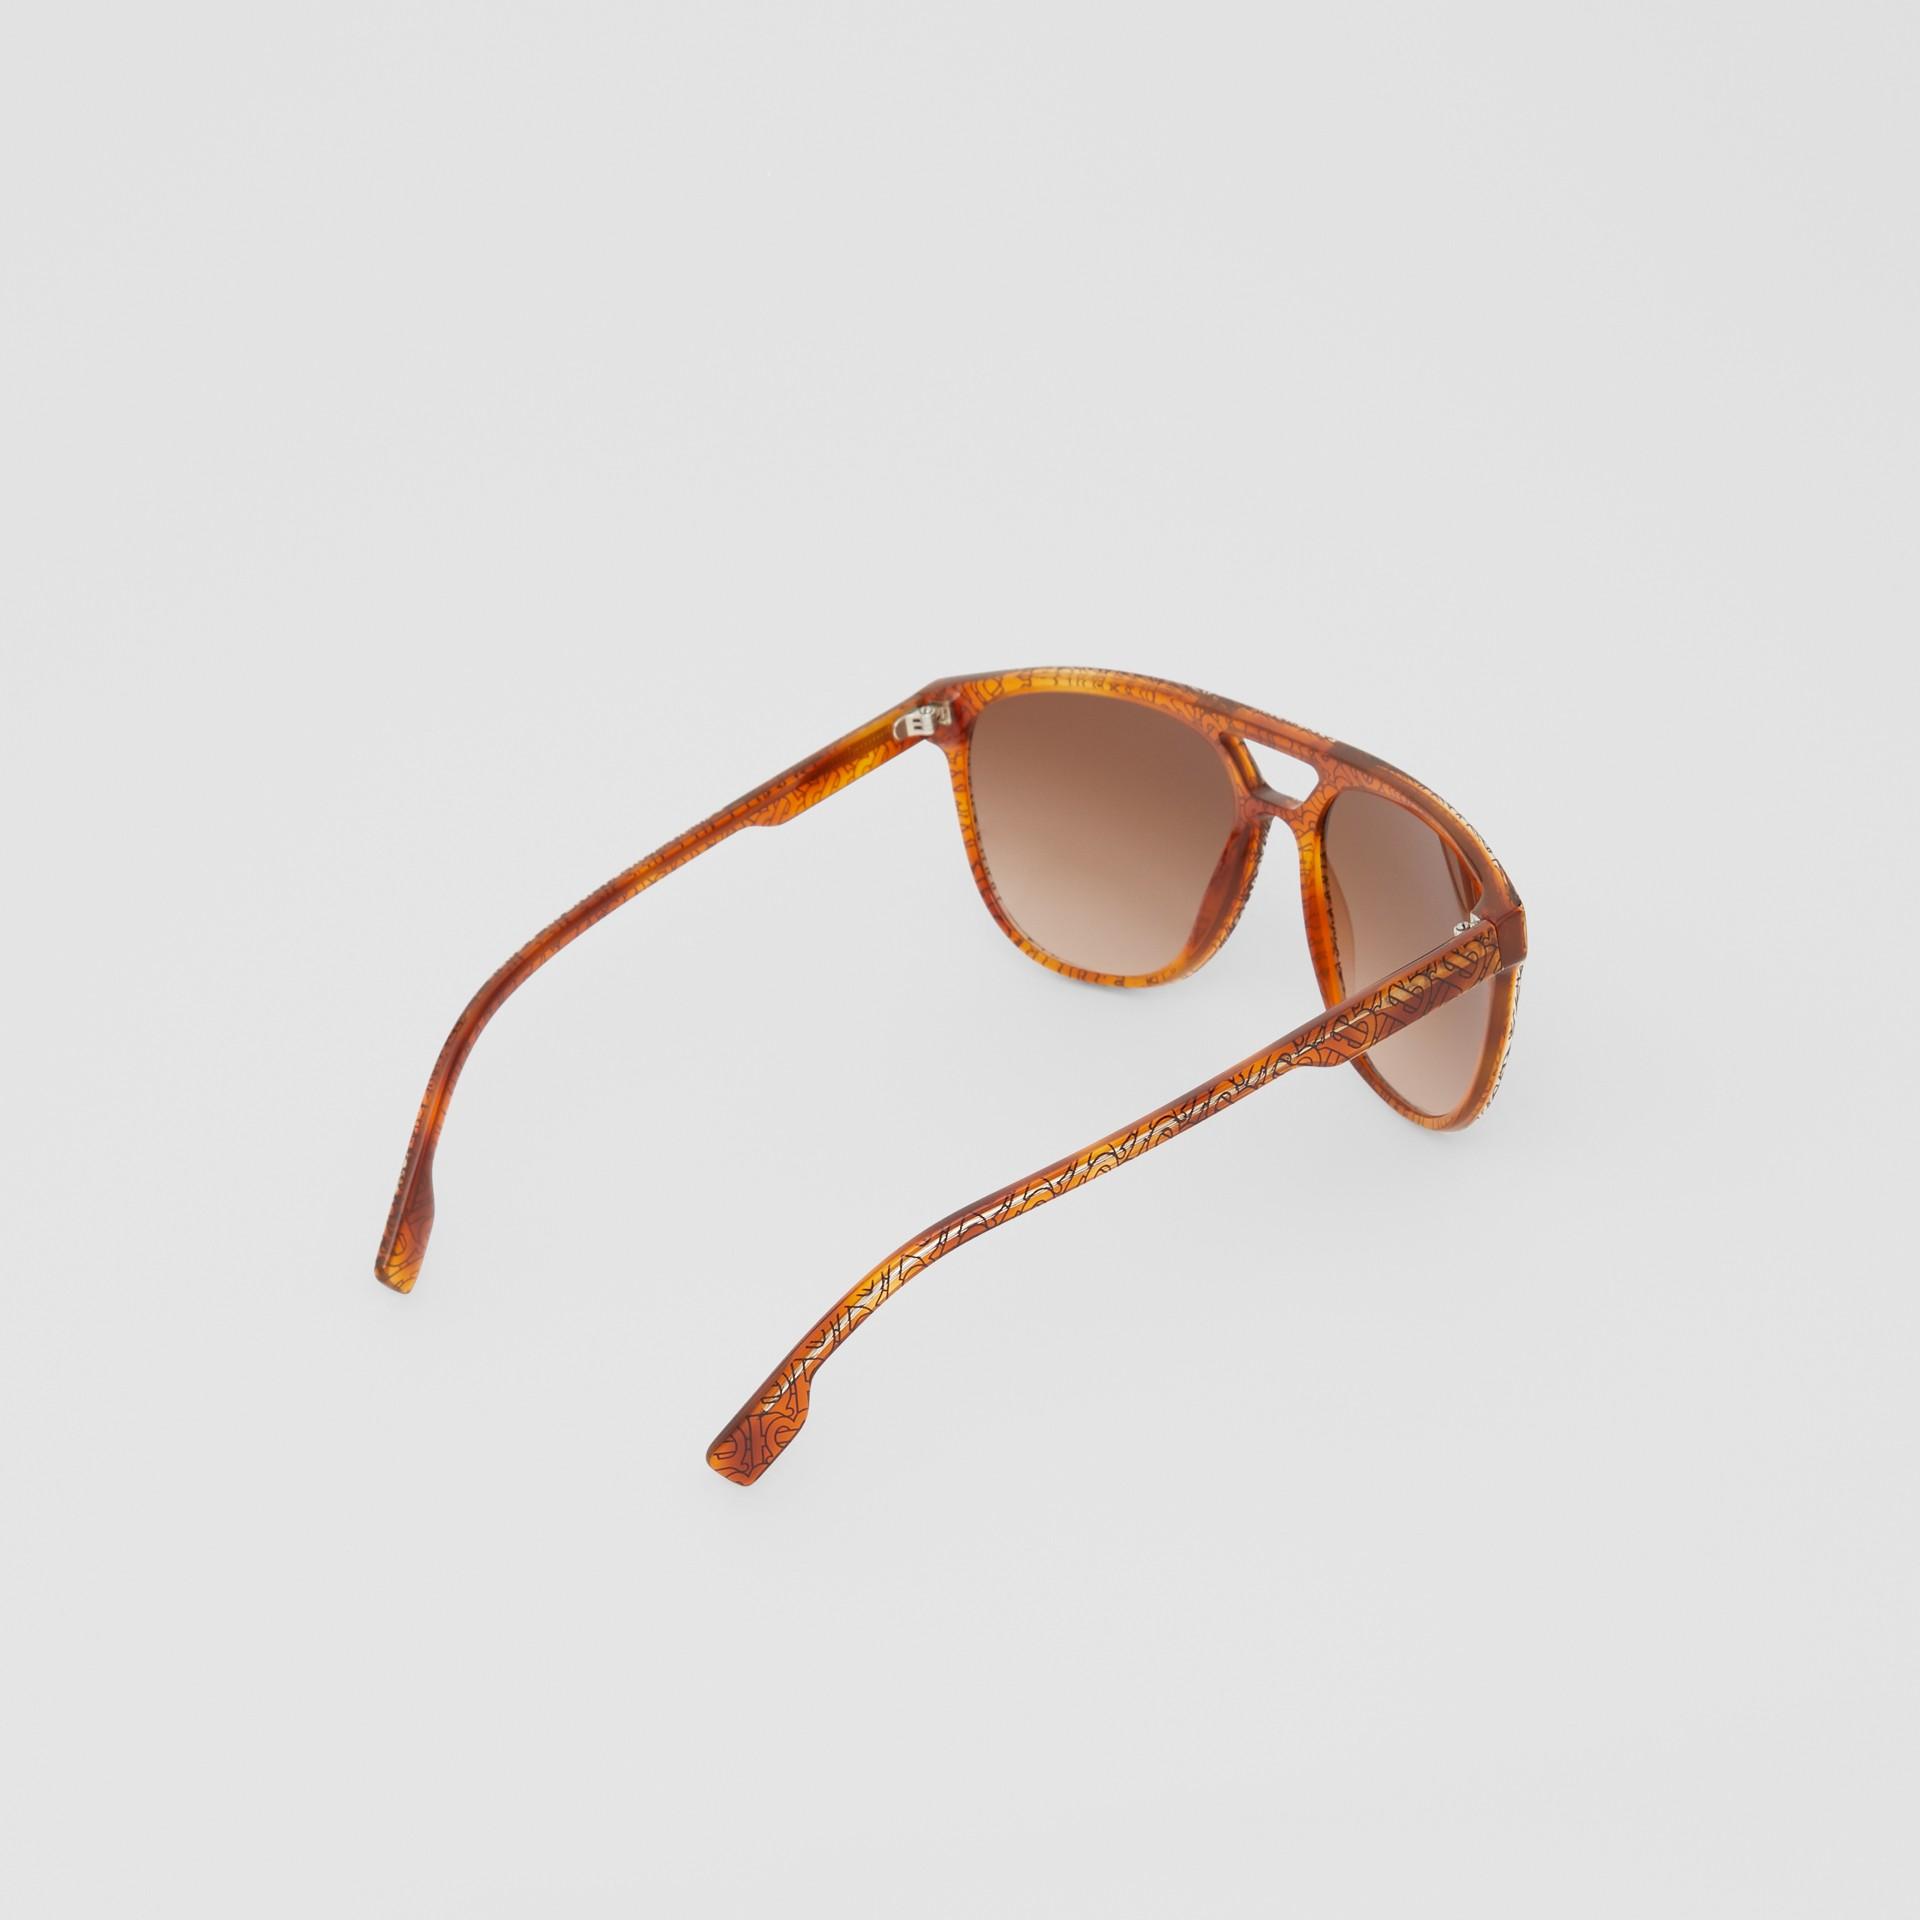 Navigator Sunglasses in Tortoiseshell Amber - Men | Burberry - gallery image 4